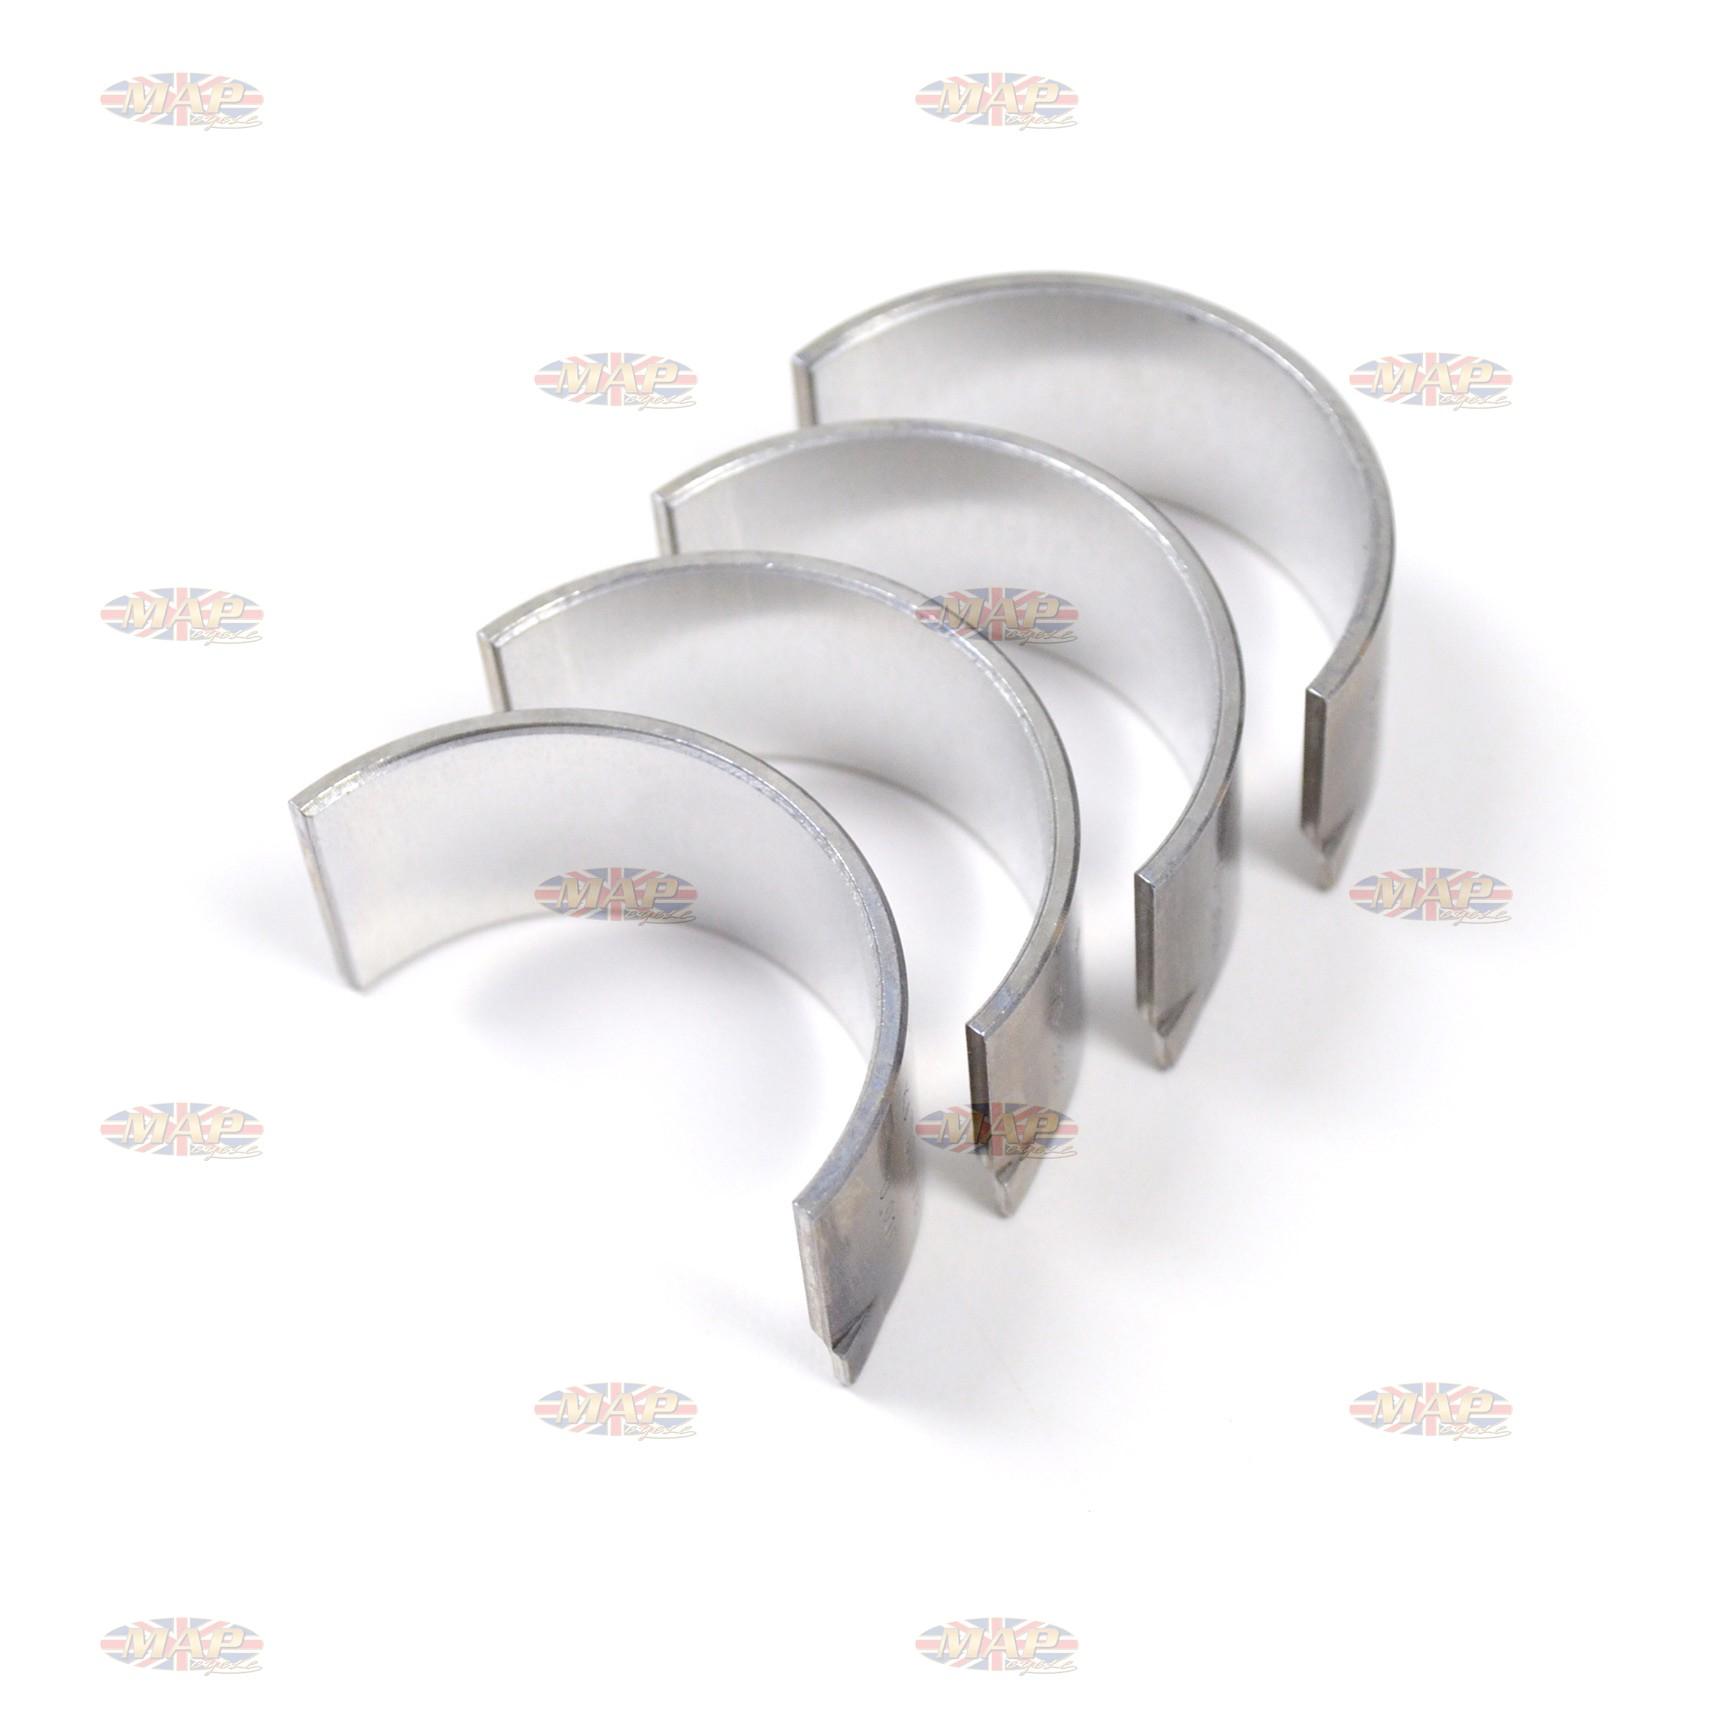 ROD BEARING/ TRI 650-750 II 010 B2026M/E010